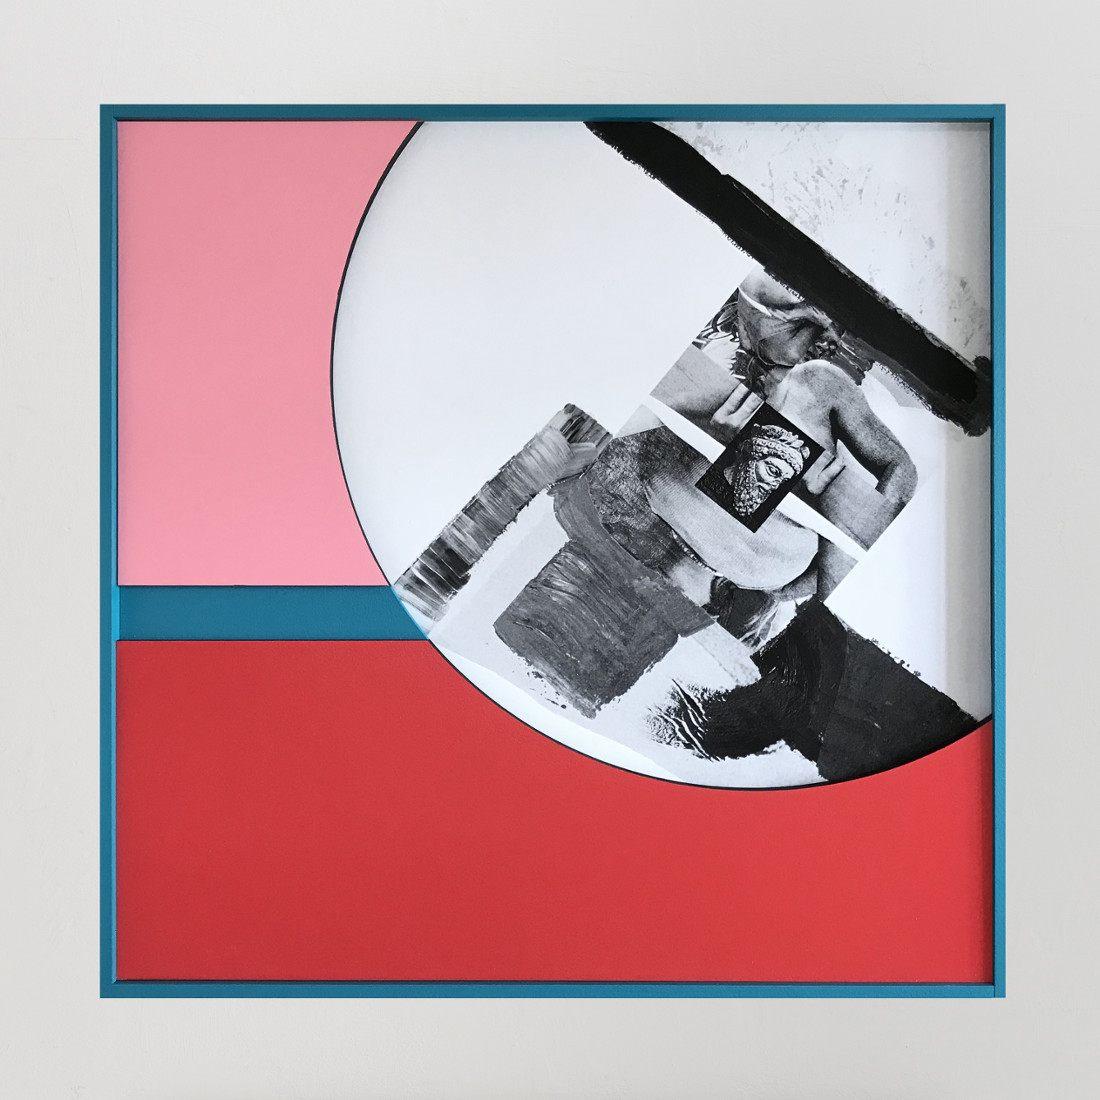 Filip Berendt<br />Monomyth II G<br />2018<br />archival pigment print on dibond acrylic paint, MDF<br />72.5x56.5cm